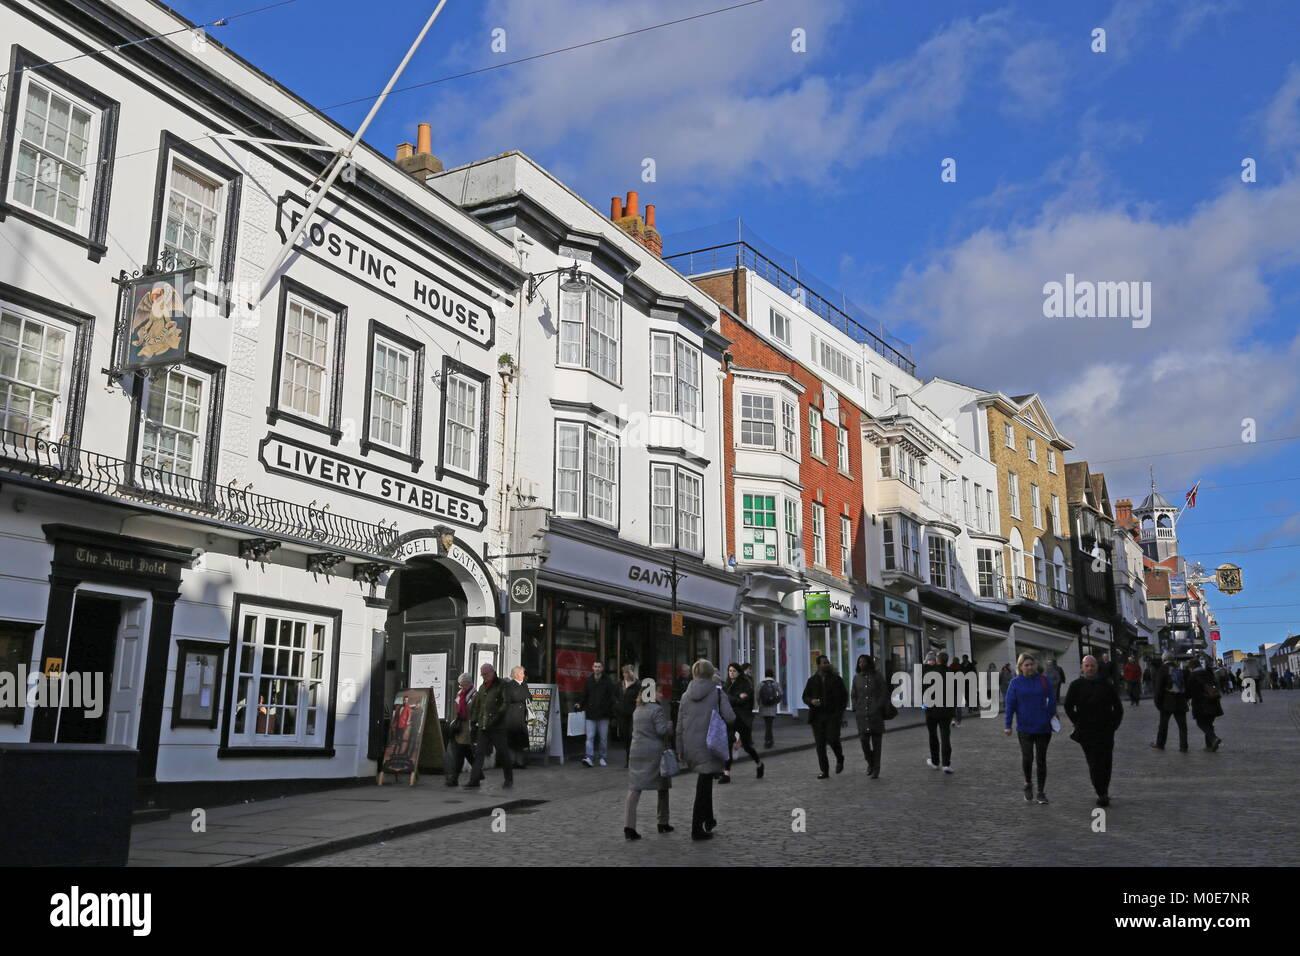 Angel Hotel, High Street, Guildford, Surrey, England, Great Britain, United Kingdom, UK, Europe - Stock Image